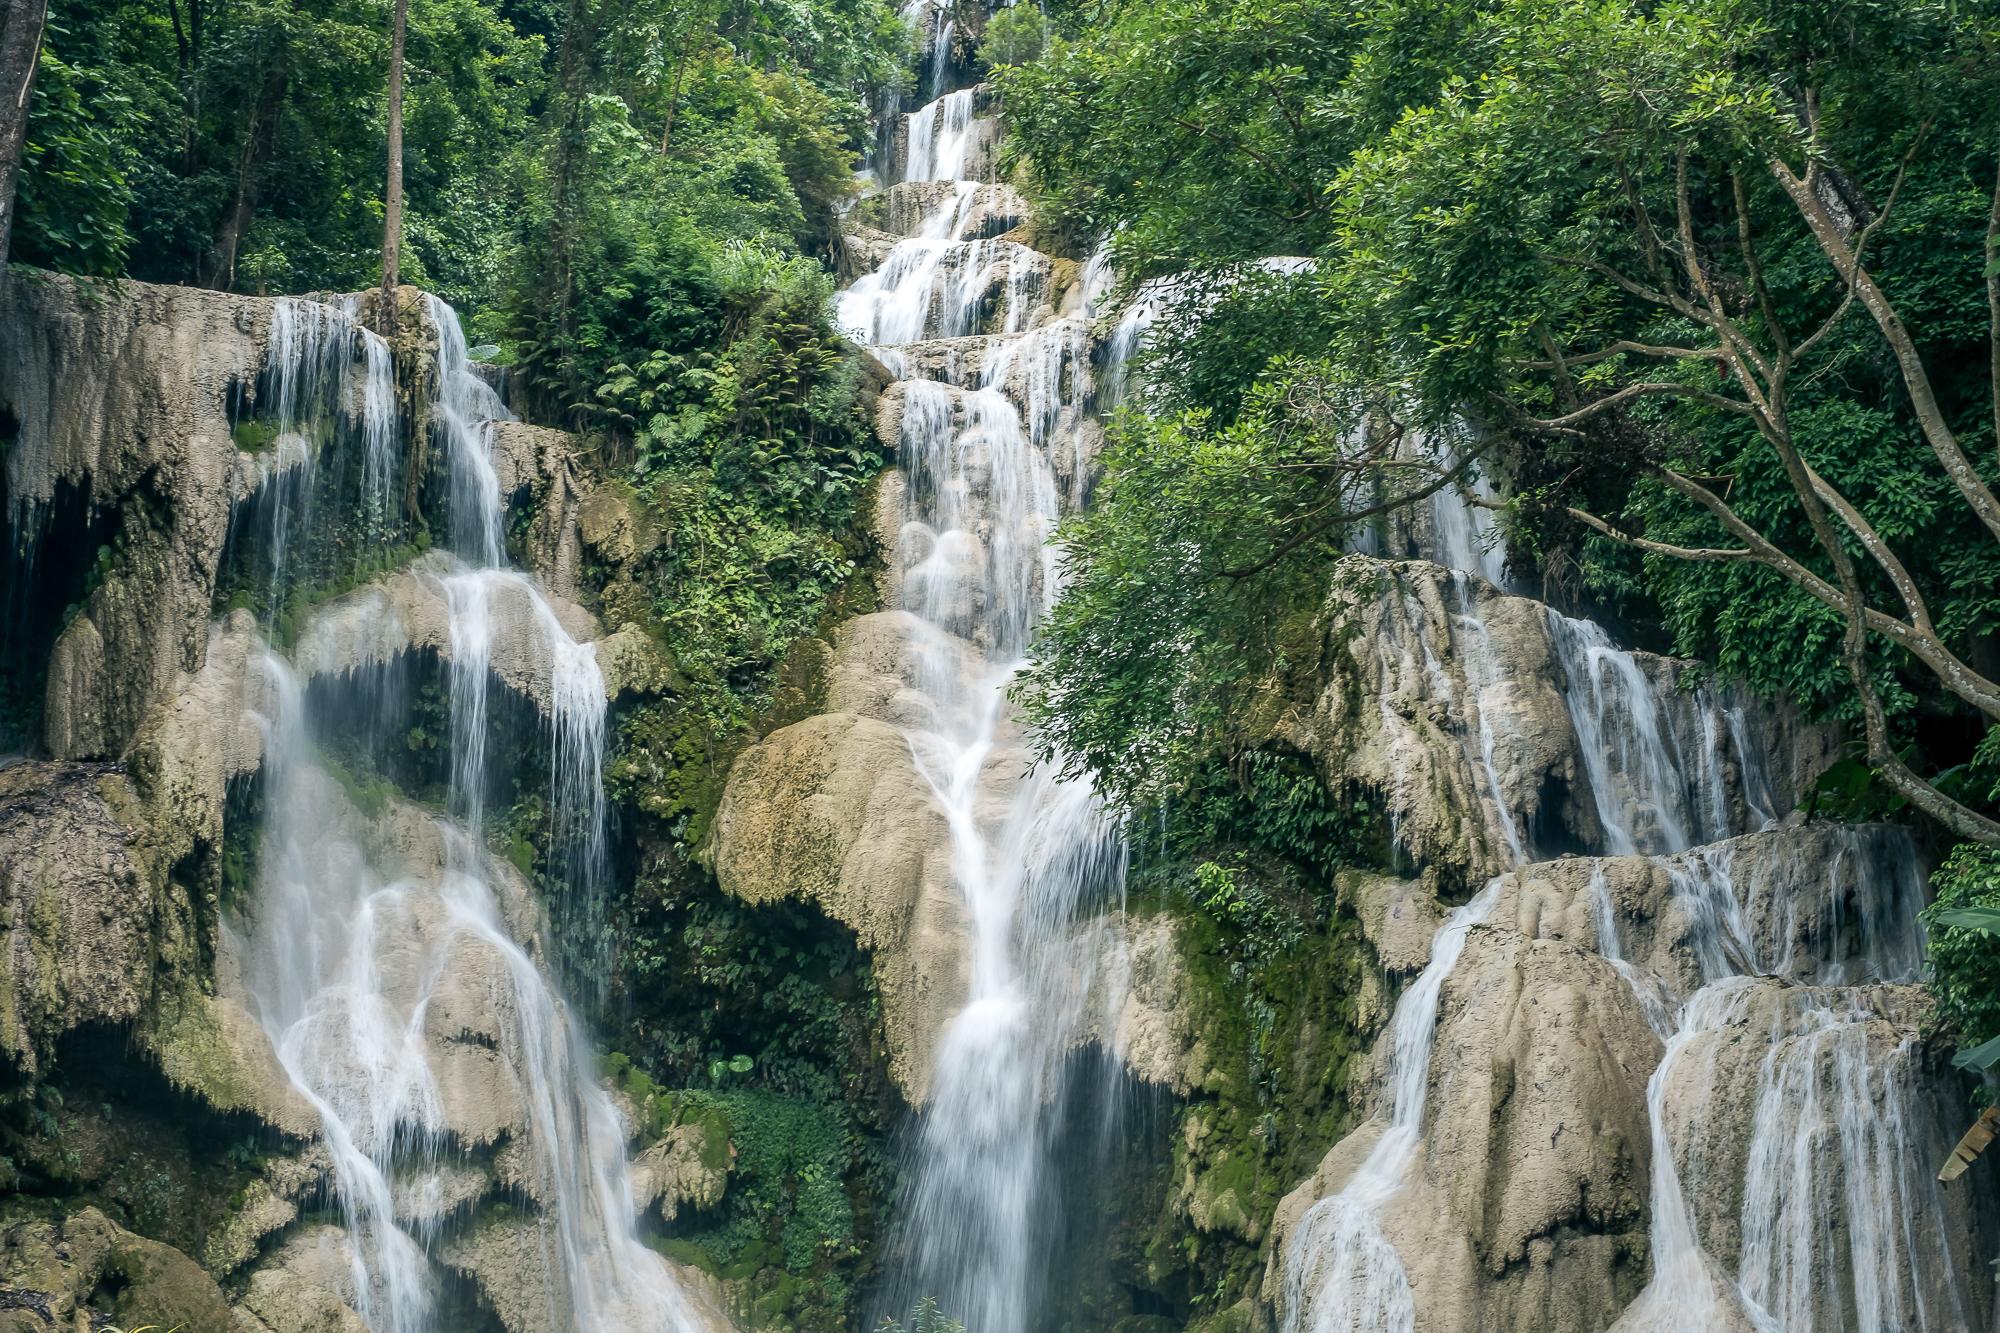 LAOS_Honeymoon_TheOutsiderBlog_DSCF9644.JPG